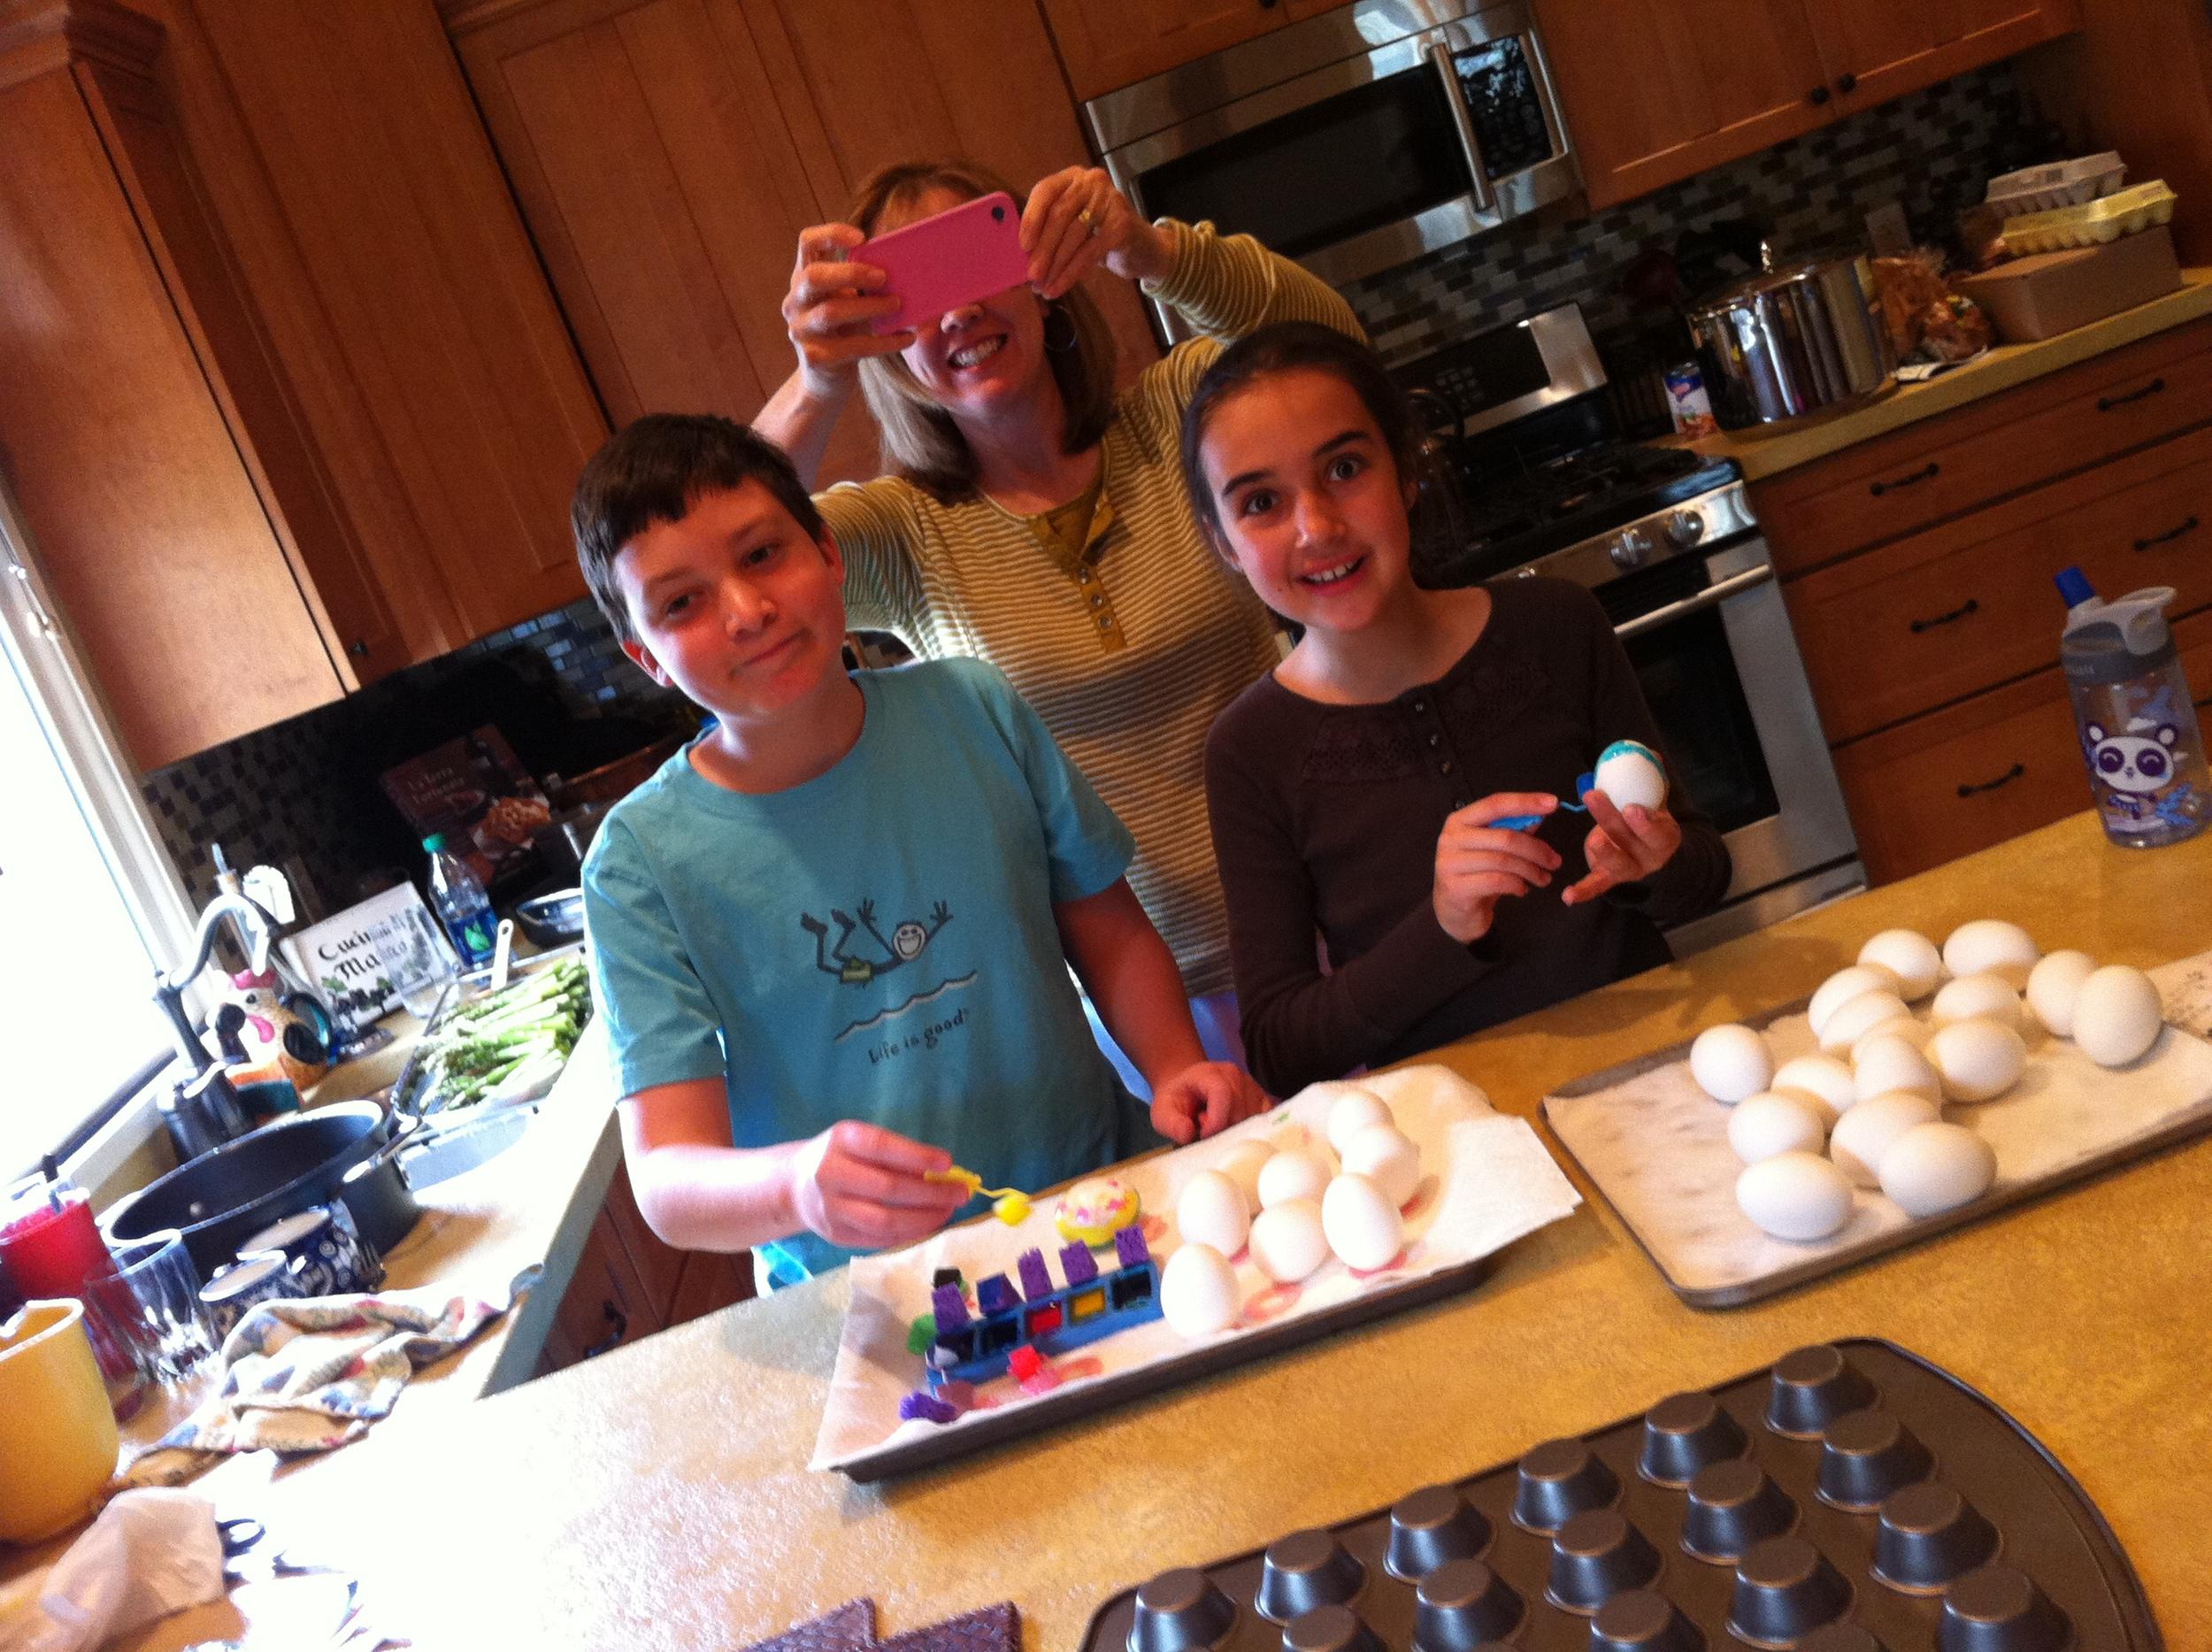 Jonathan and Zoe painting eggs.